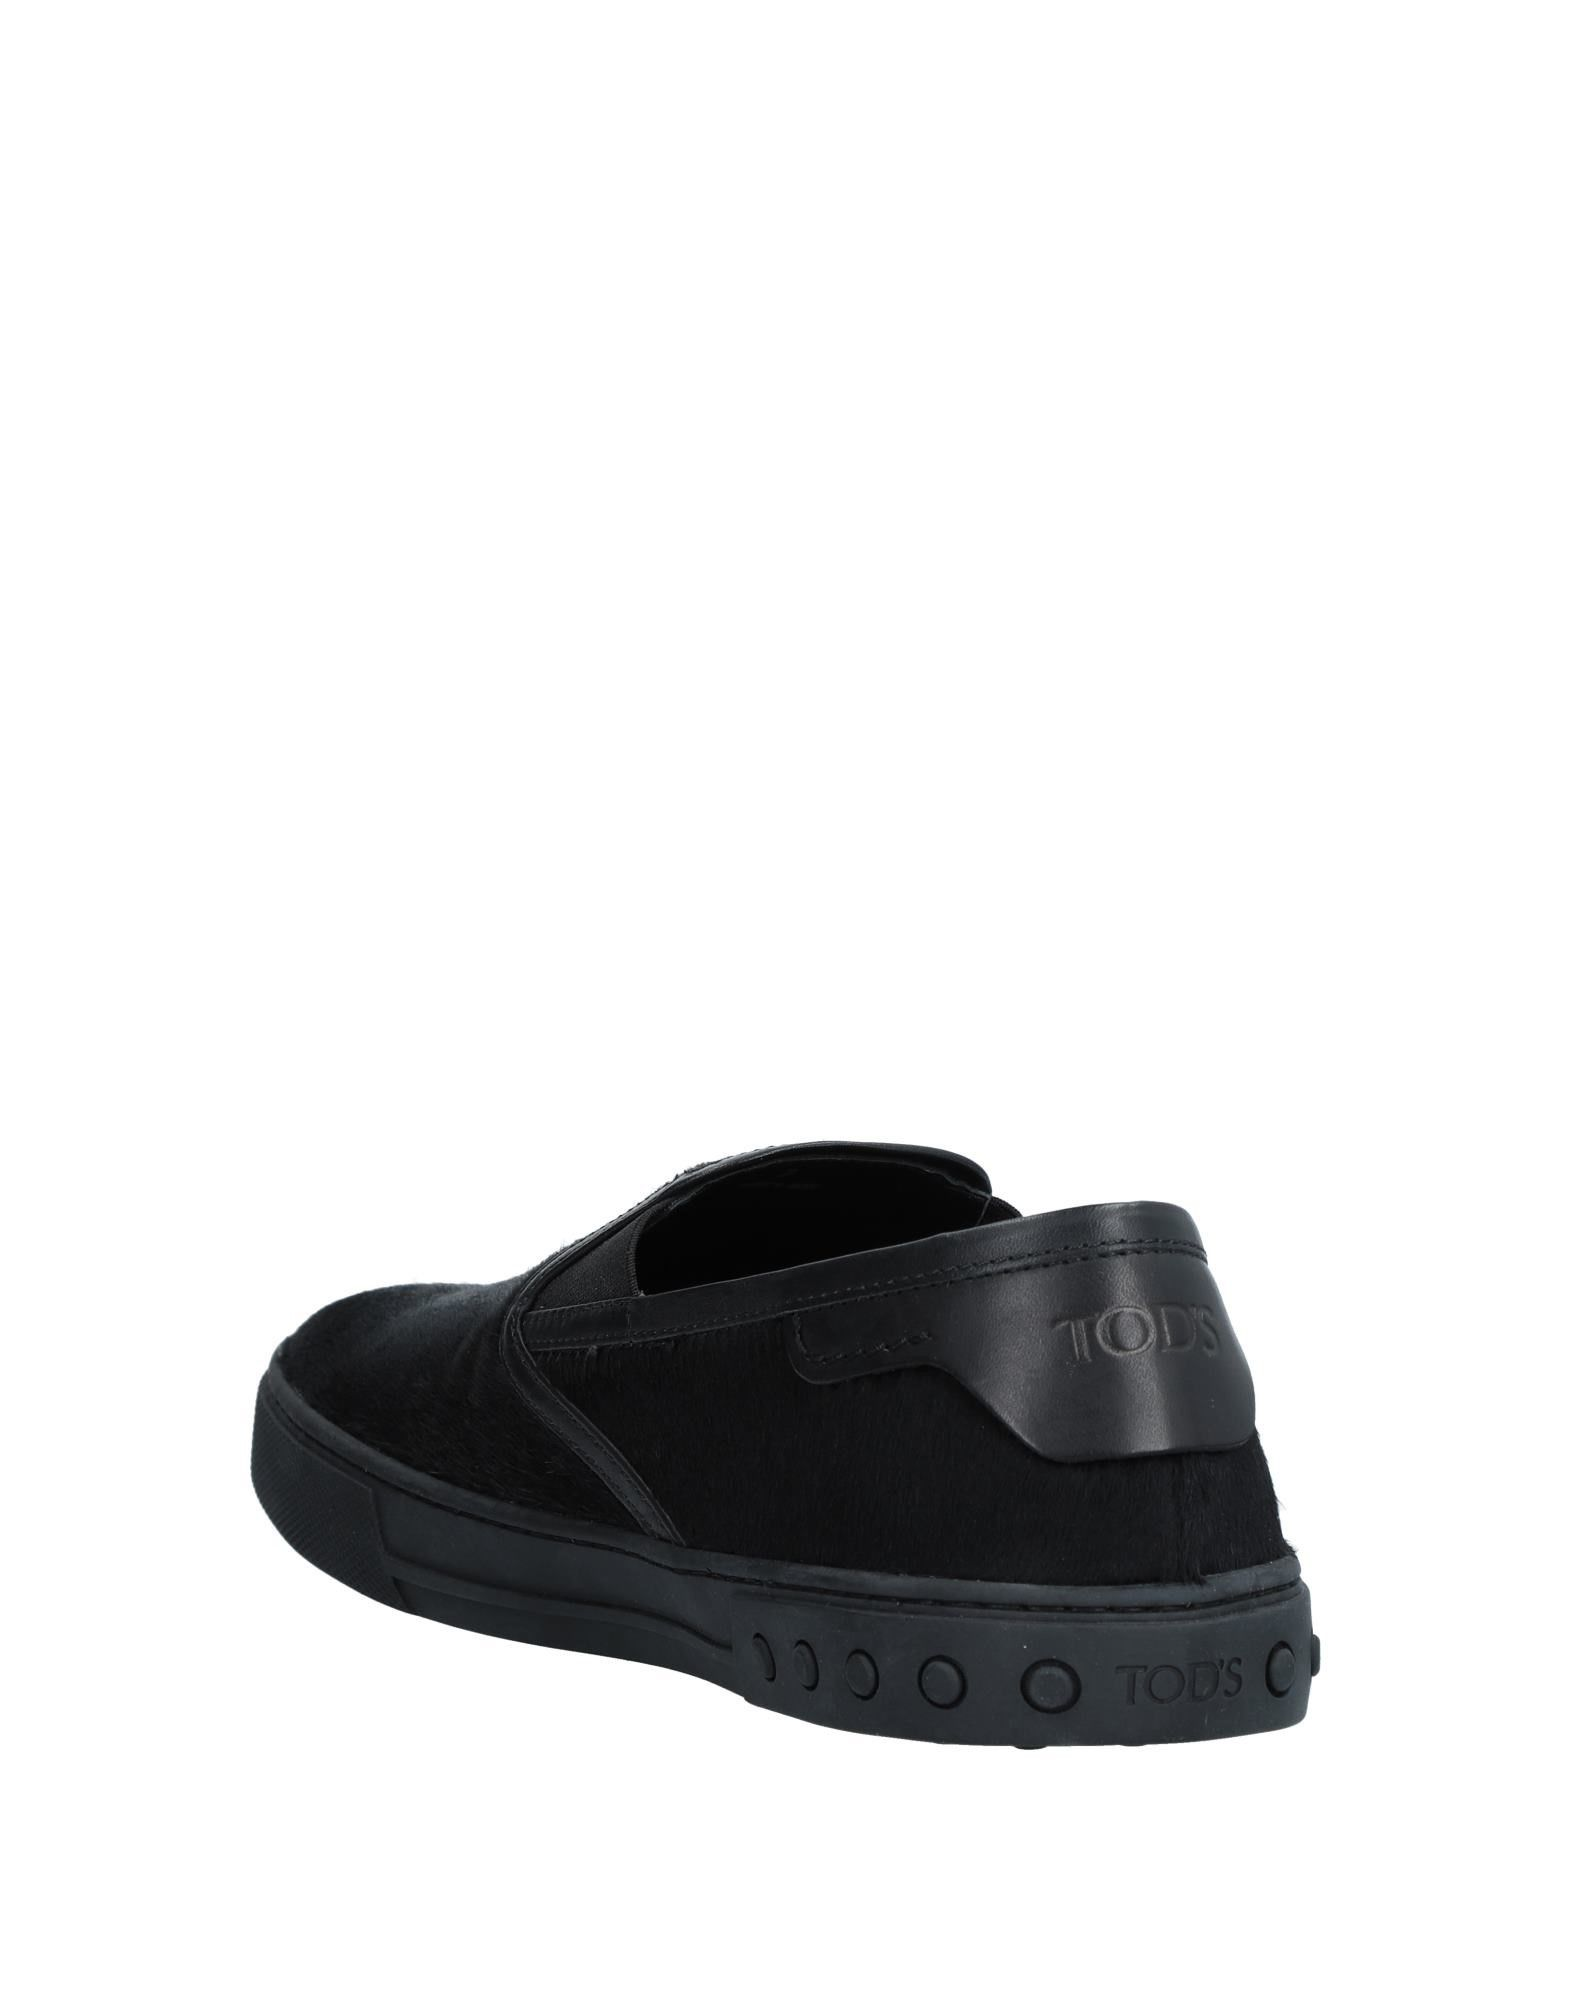 Tod's Gute Sneakers Herren  11540576HD Gute Tod's Qualität beliebte Schuhe 0f8ac0